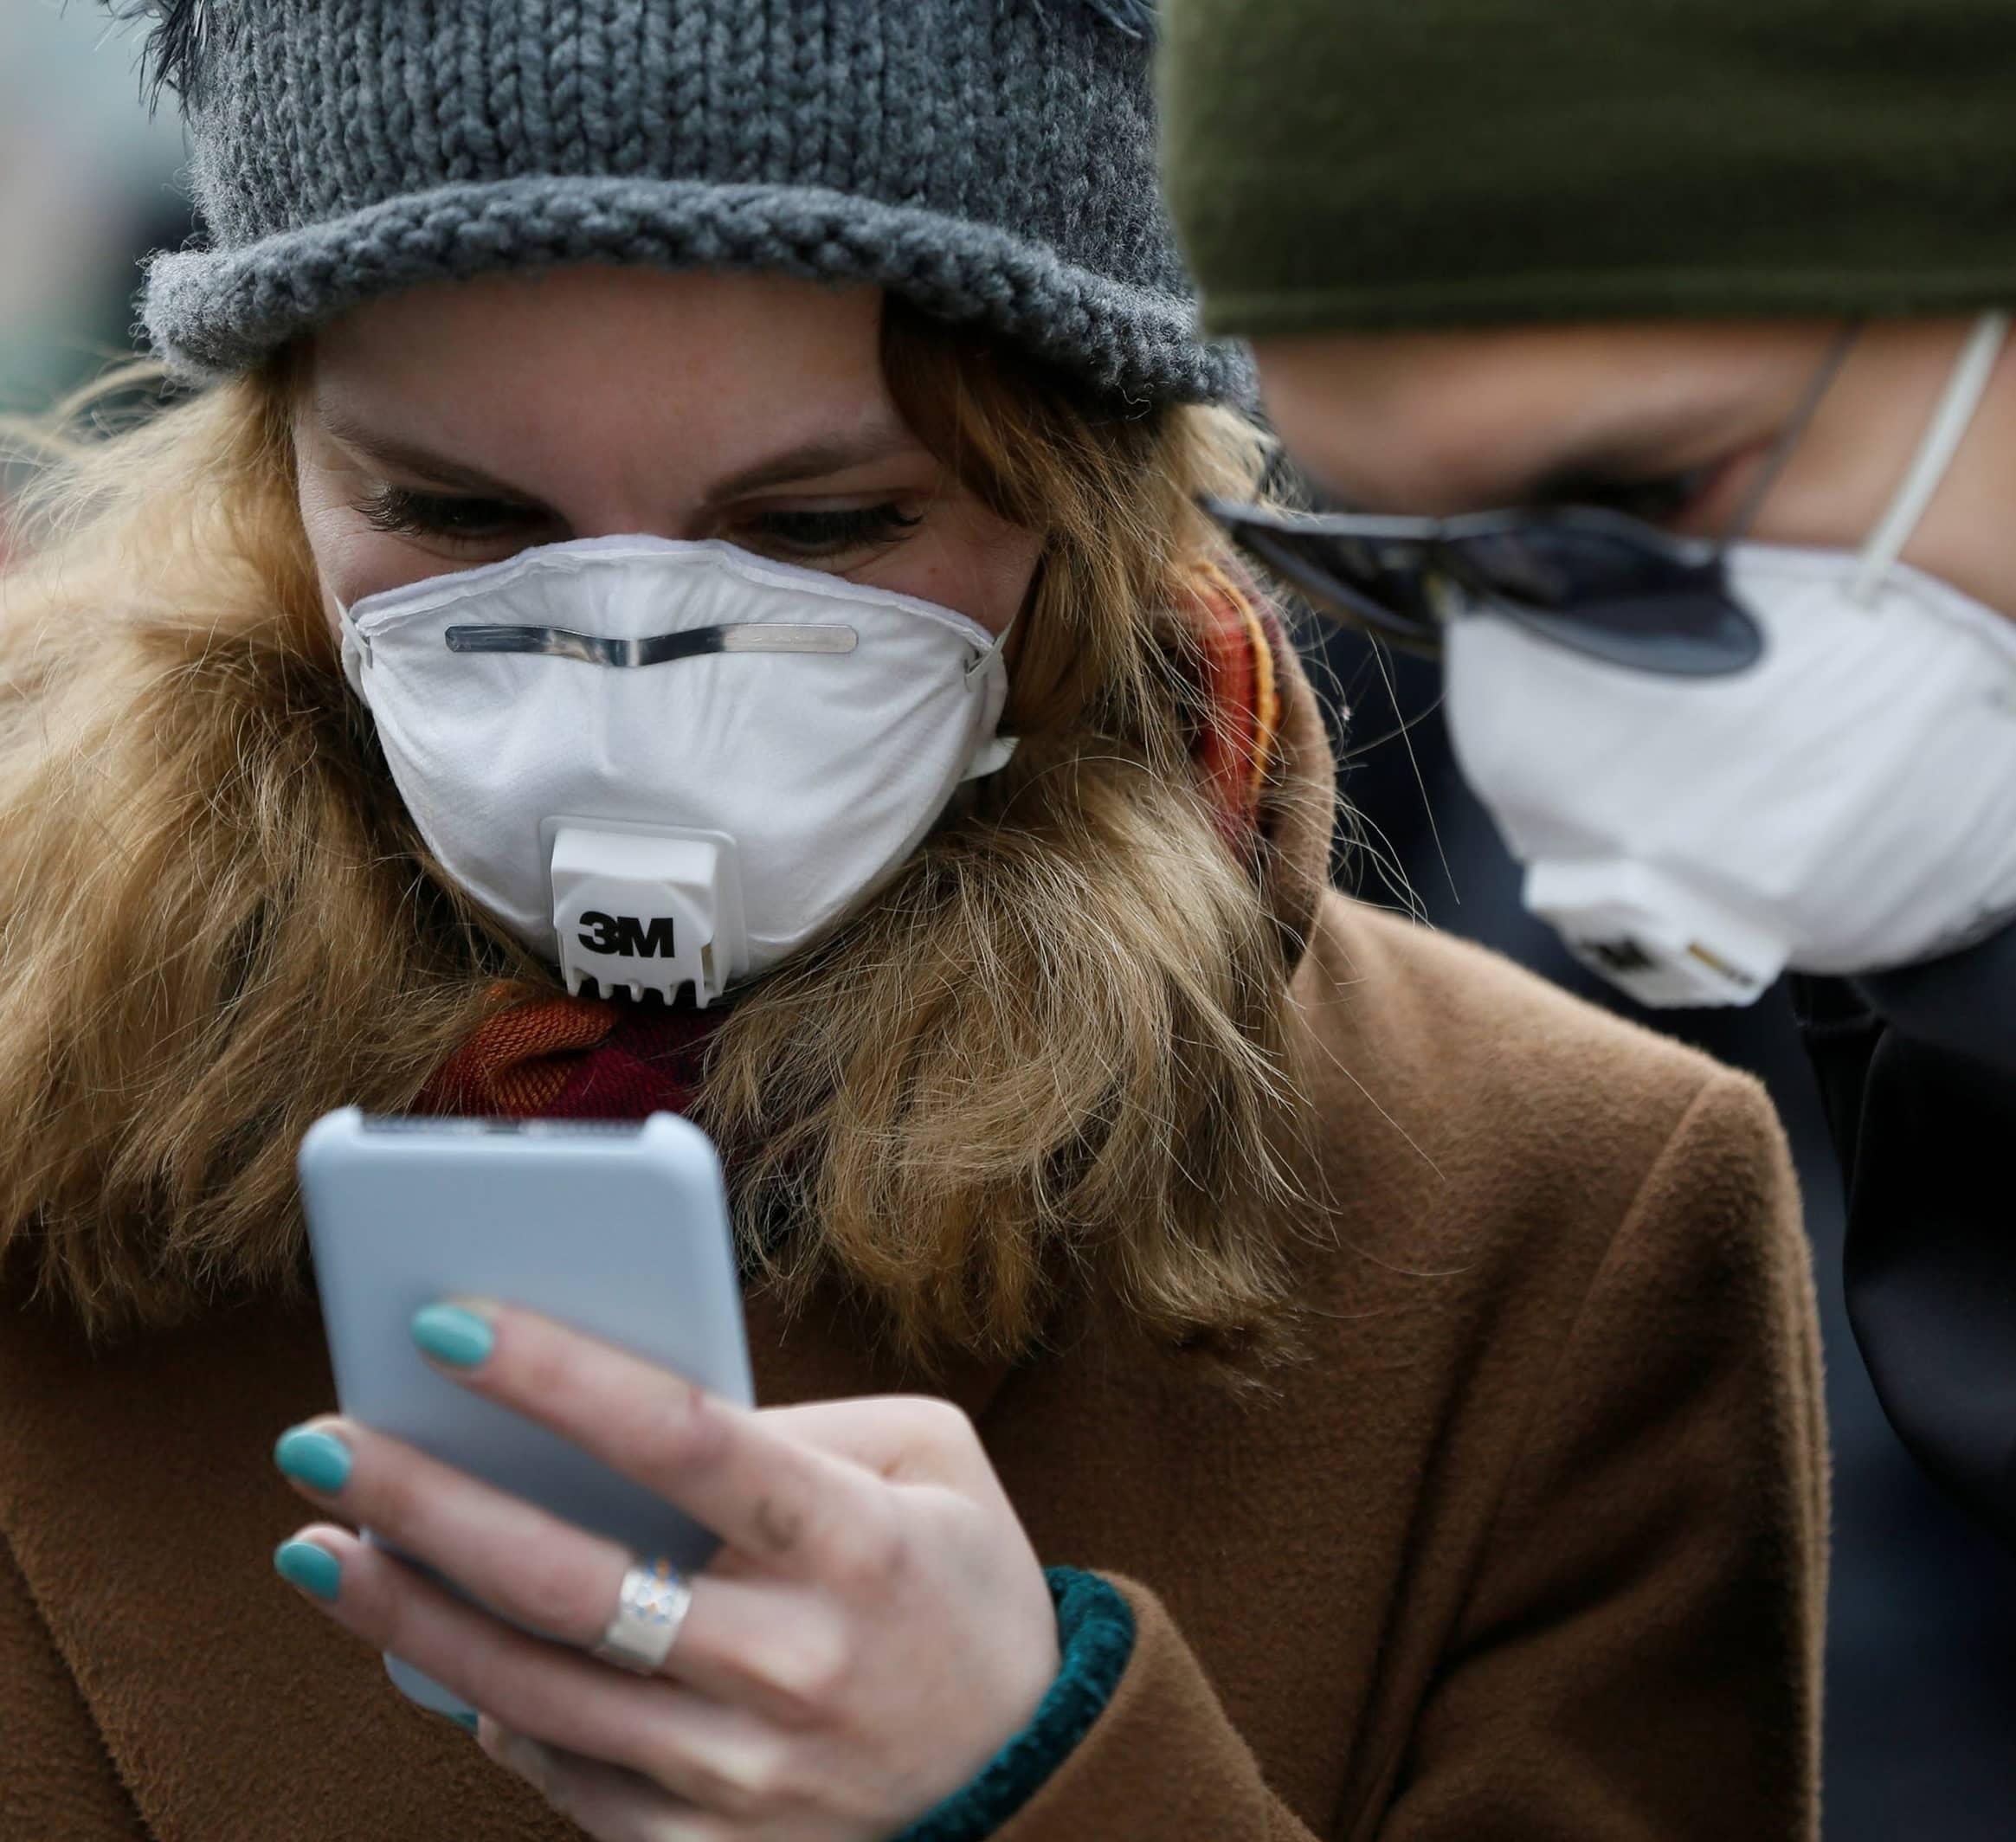 Britain Scraps Virus Tracing App For Google-Apple System